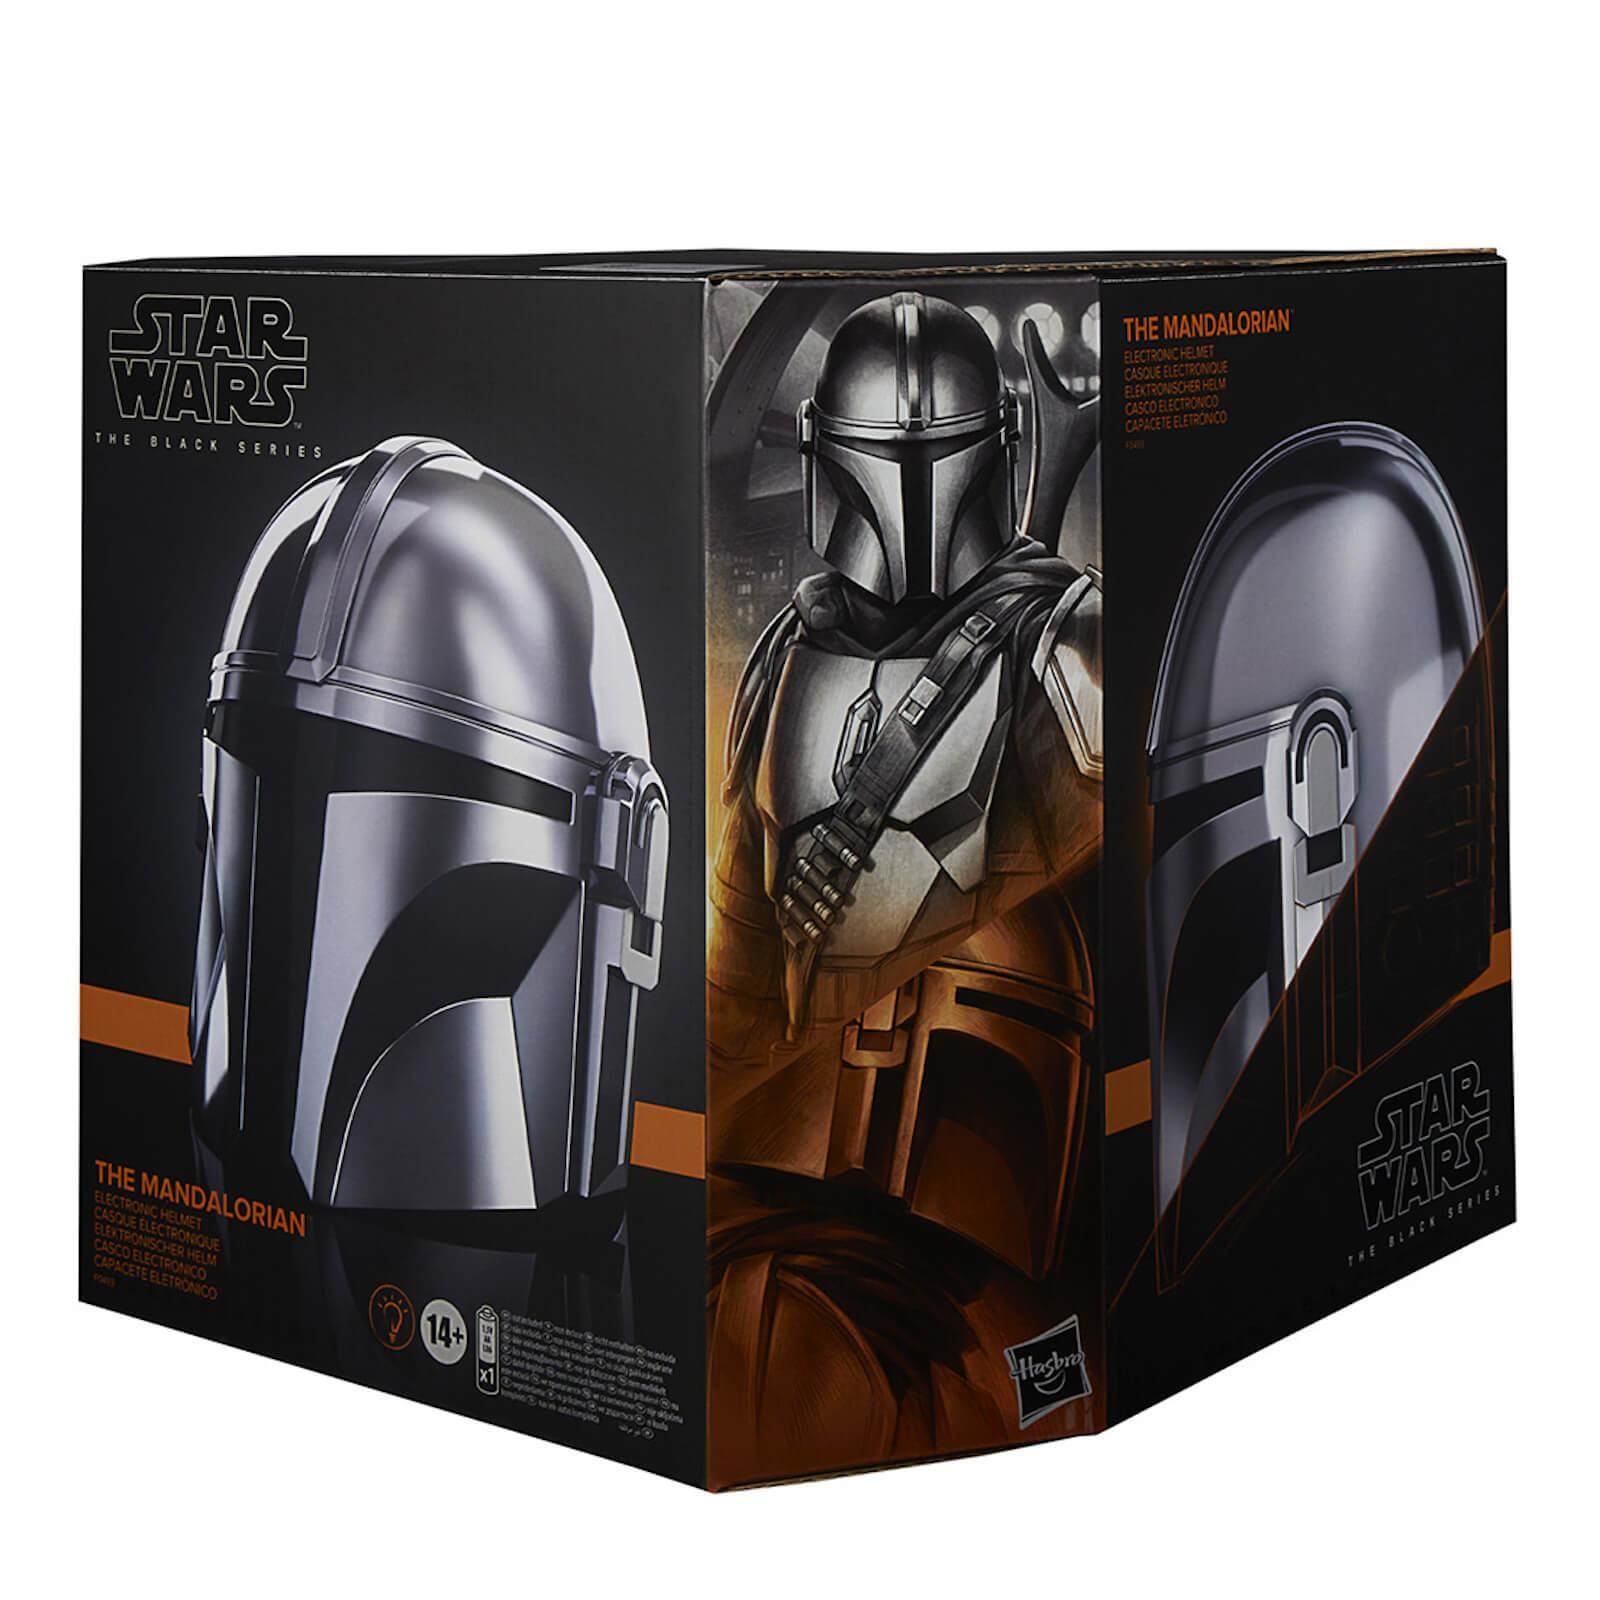 Image of Hasbro Star Wars The Black Series The Mandalorian Electronic Helmet